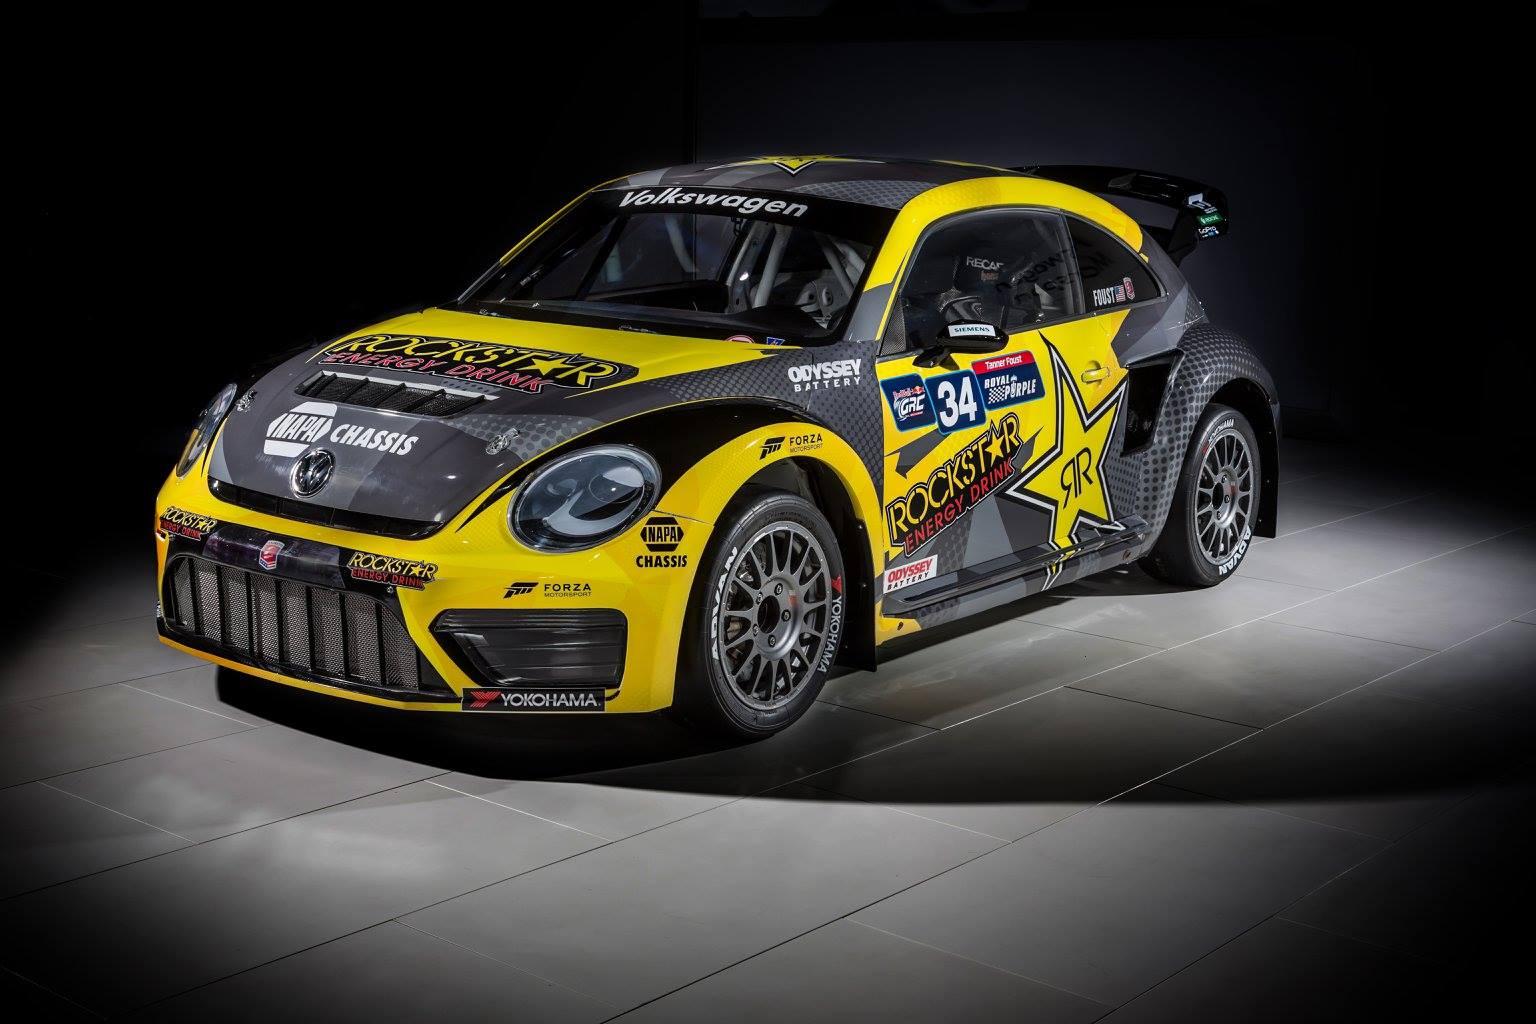 Tanner Foust Unveils 2015 Rockstar Energy Varx Beetle